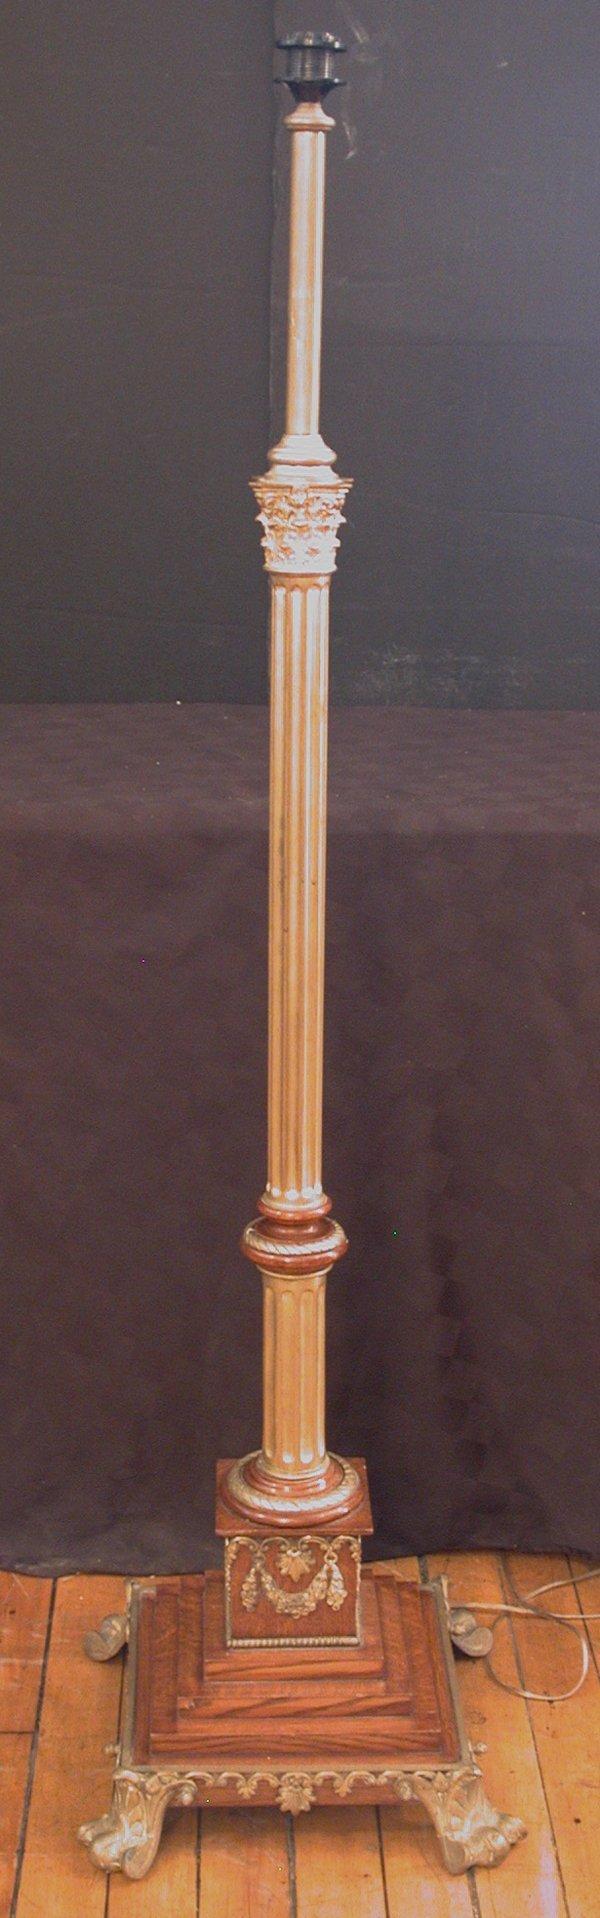 103:ANTIQUE BRONZE & WOOD FLOOR LAMP W/ PAW FEET 15656